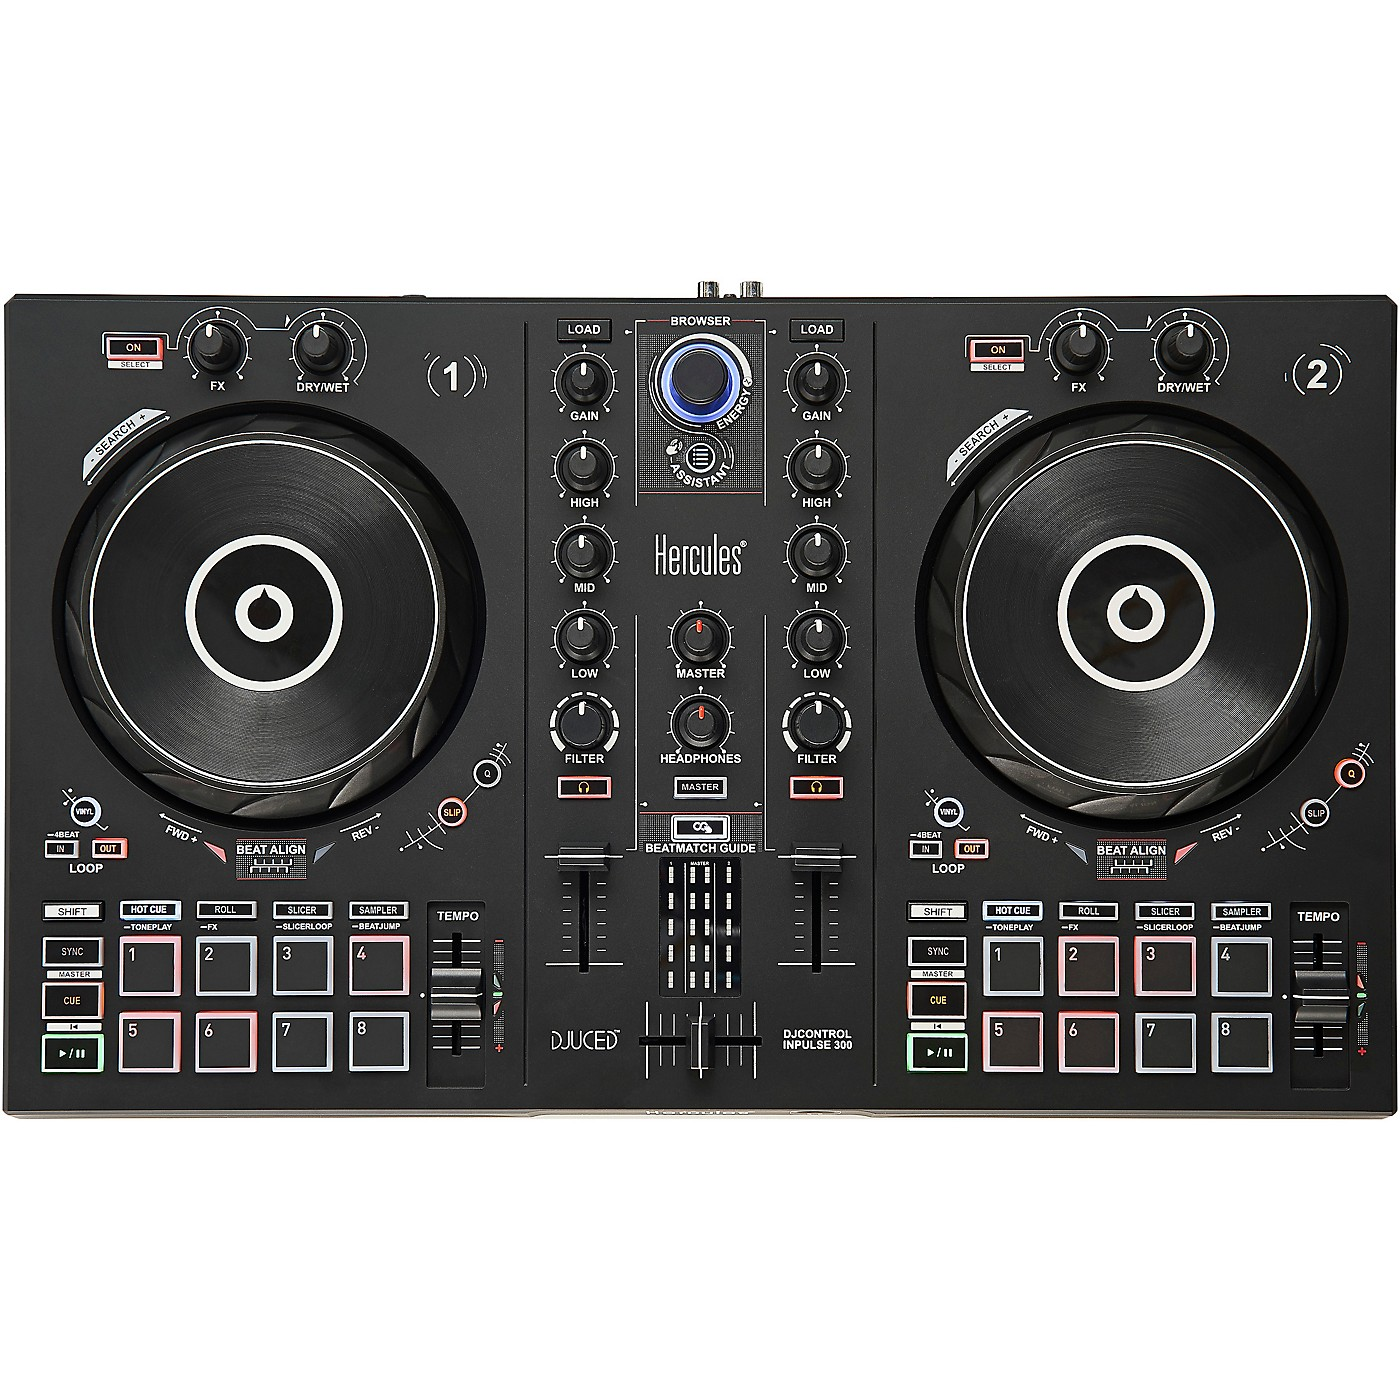 Hercules DJ DJControl Inpulse 300 DJ Controller thumbnail